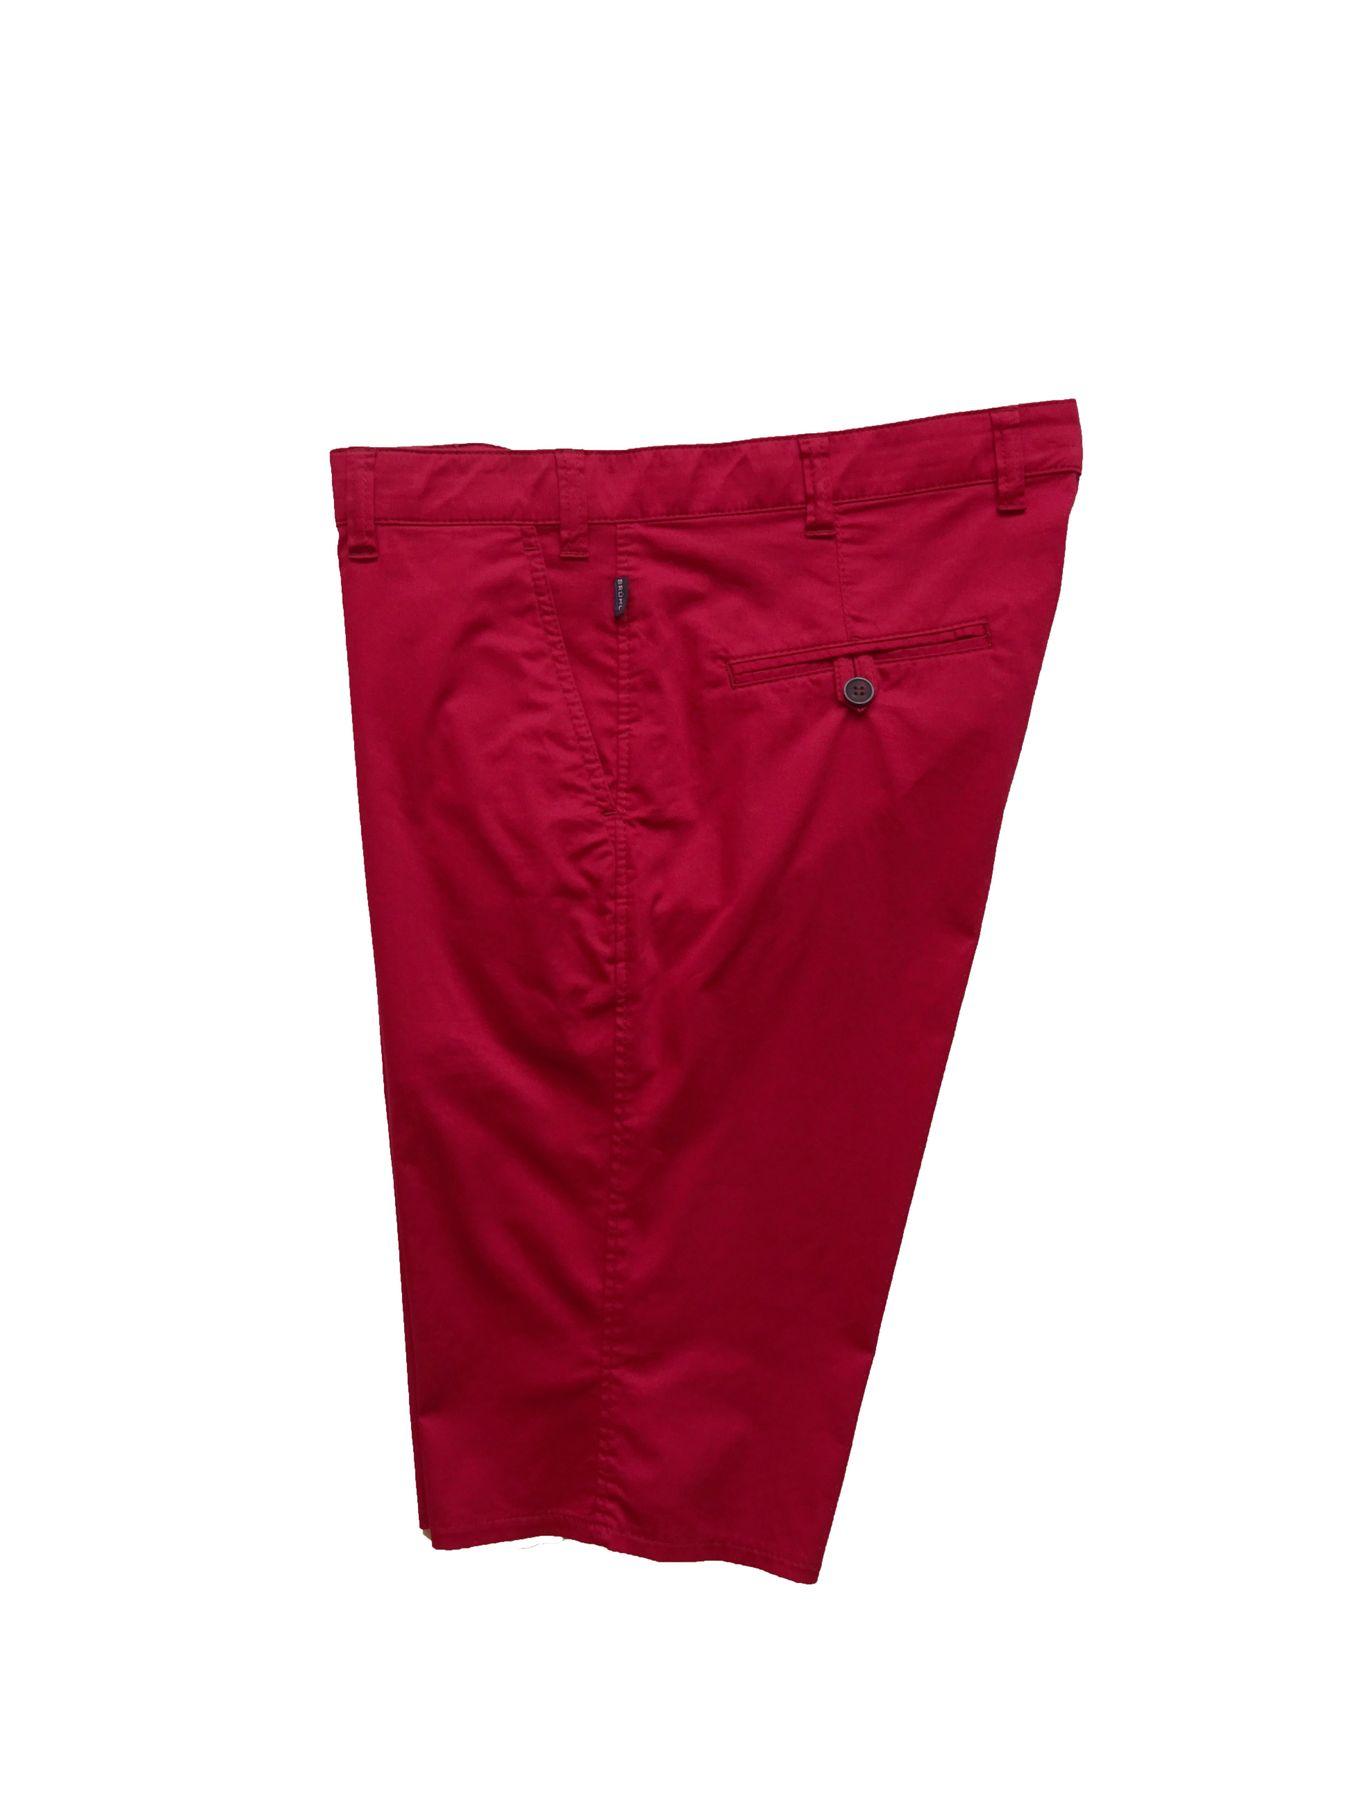 Brühl - Herren Shorts aus Baumwolle in rot, Venice Short (0622181690100 ) – Bild 3